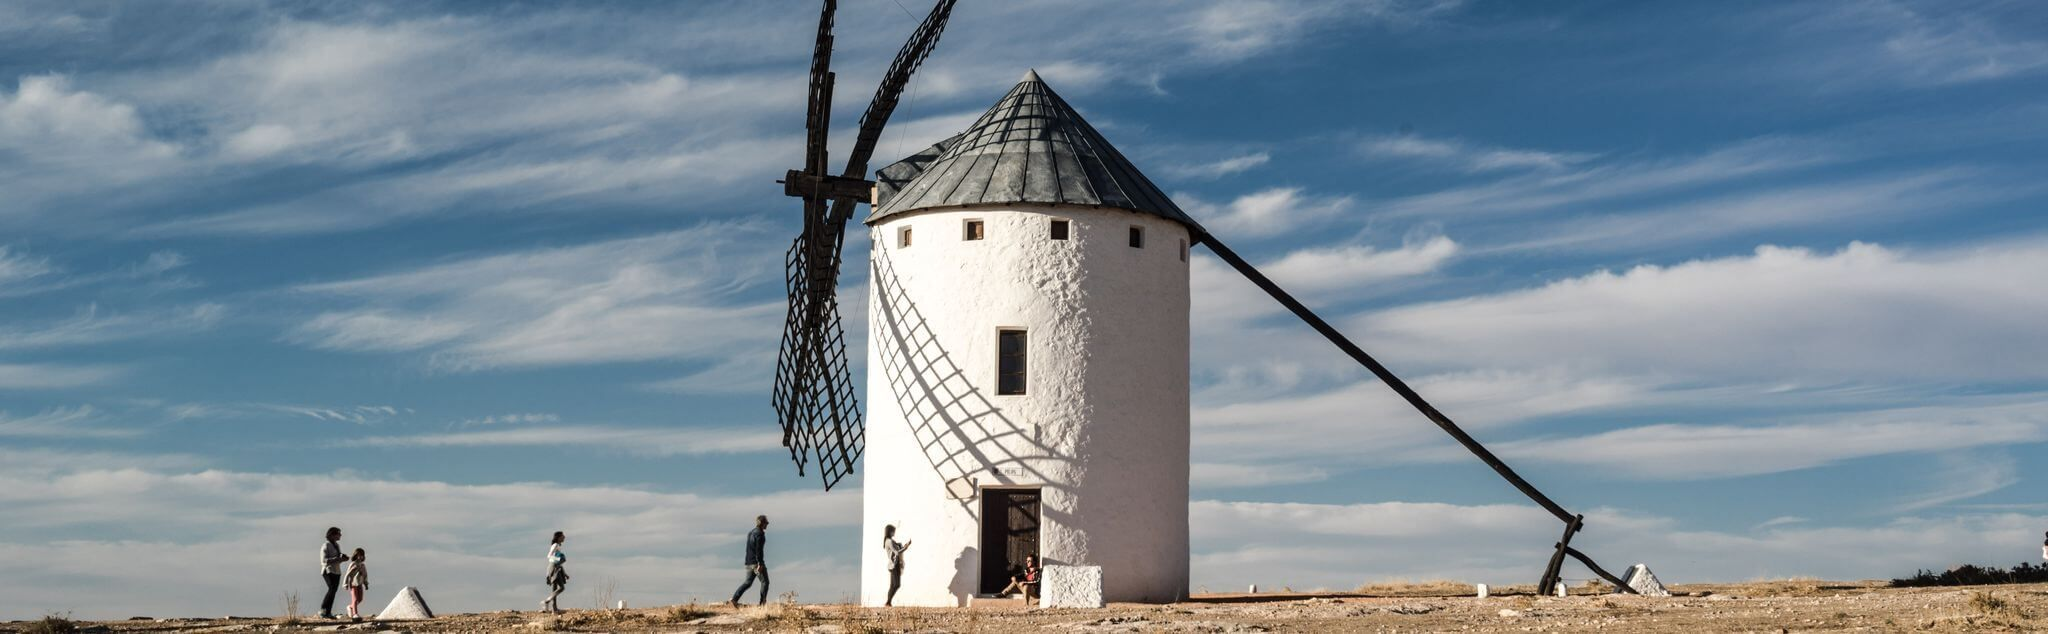 Actividades en Castilla la Mancha